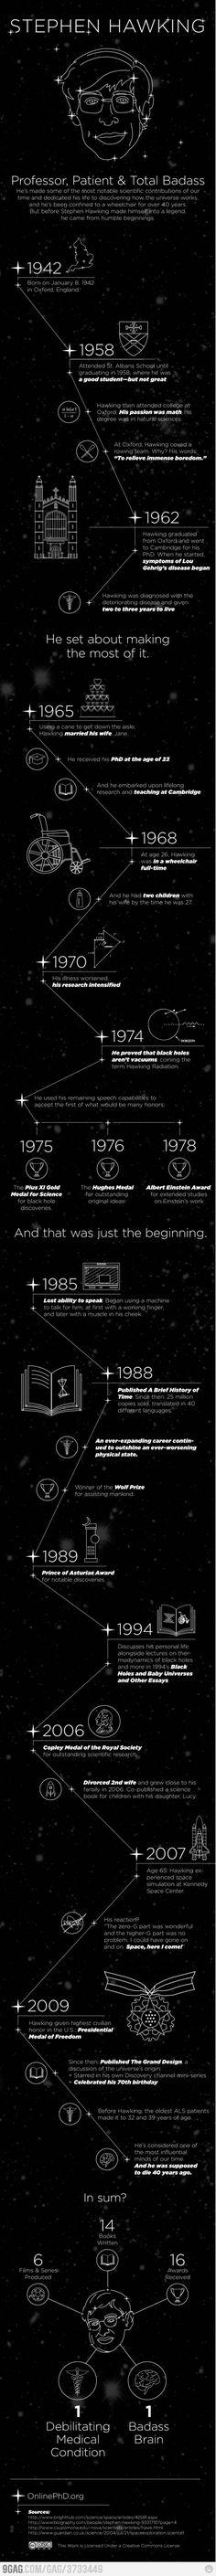 Just Stephen Hawking...